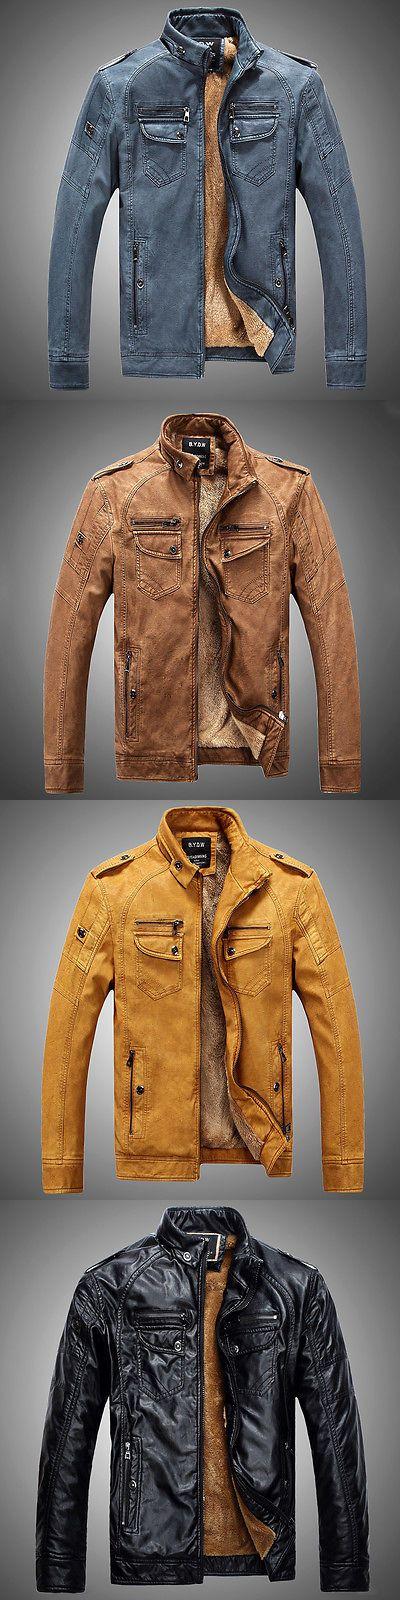 Men Coats And Jackets: Men S Genuine Lambskin Leather Jacket Black Slim Fit Biker Motorcycle Jacket -> BUY IT NOW ONLY: $34 on eBay!